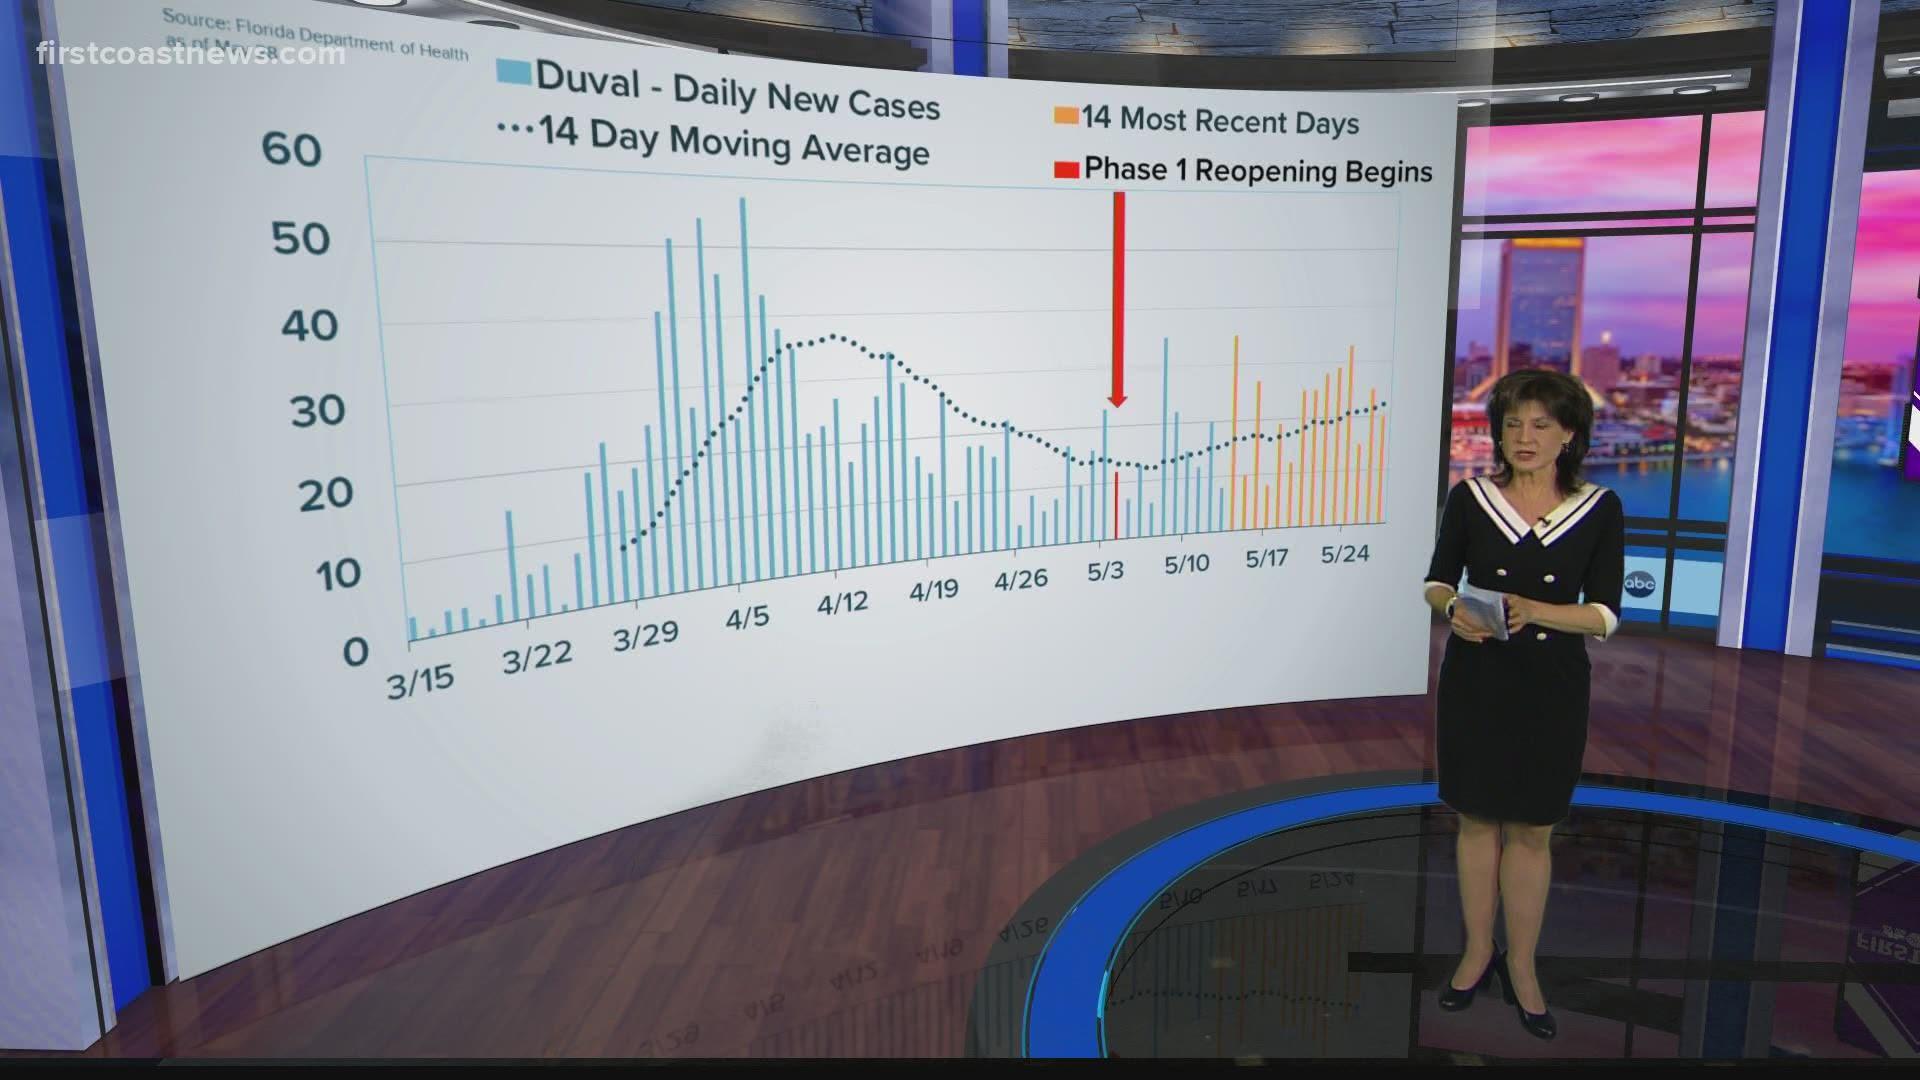 Are Florida Georgia Seeing More Coronavirus Cases Firstcoastnews Com